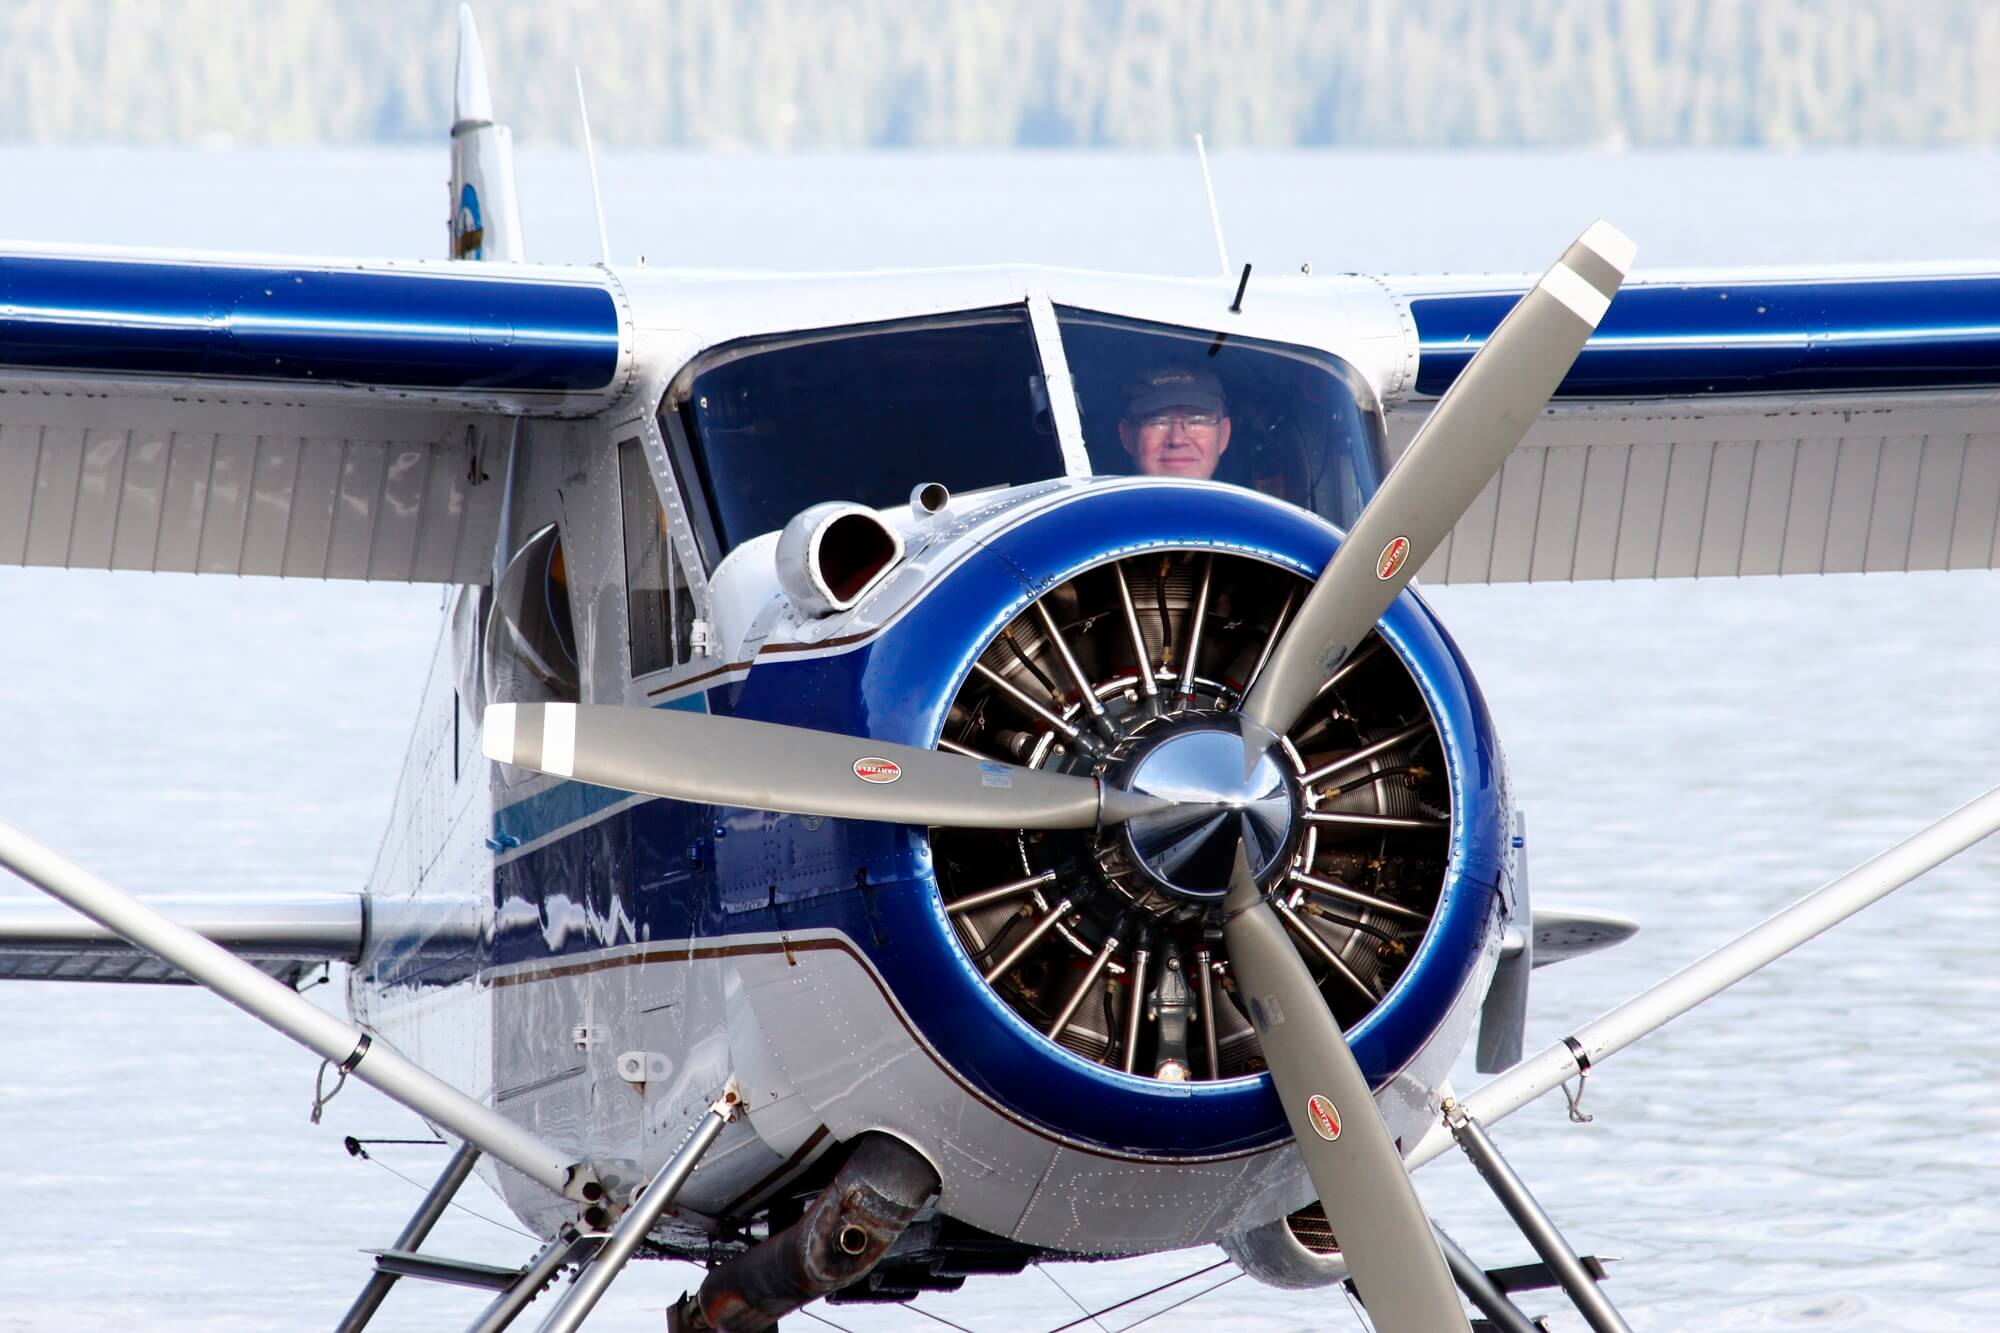 https://secureservercdn.net/72.167.241.180/c2p.415.myftpupload.com/wp-content/uploads/2018/10/Misty-Fjords-Flightseeing-5.jpg?time=1634200883